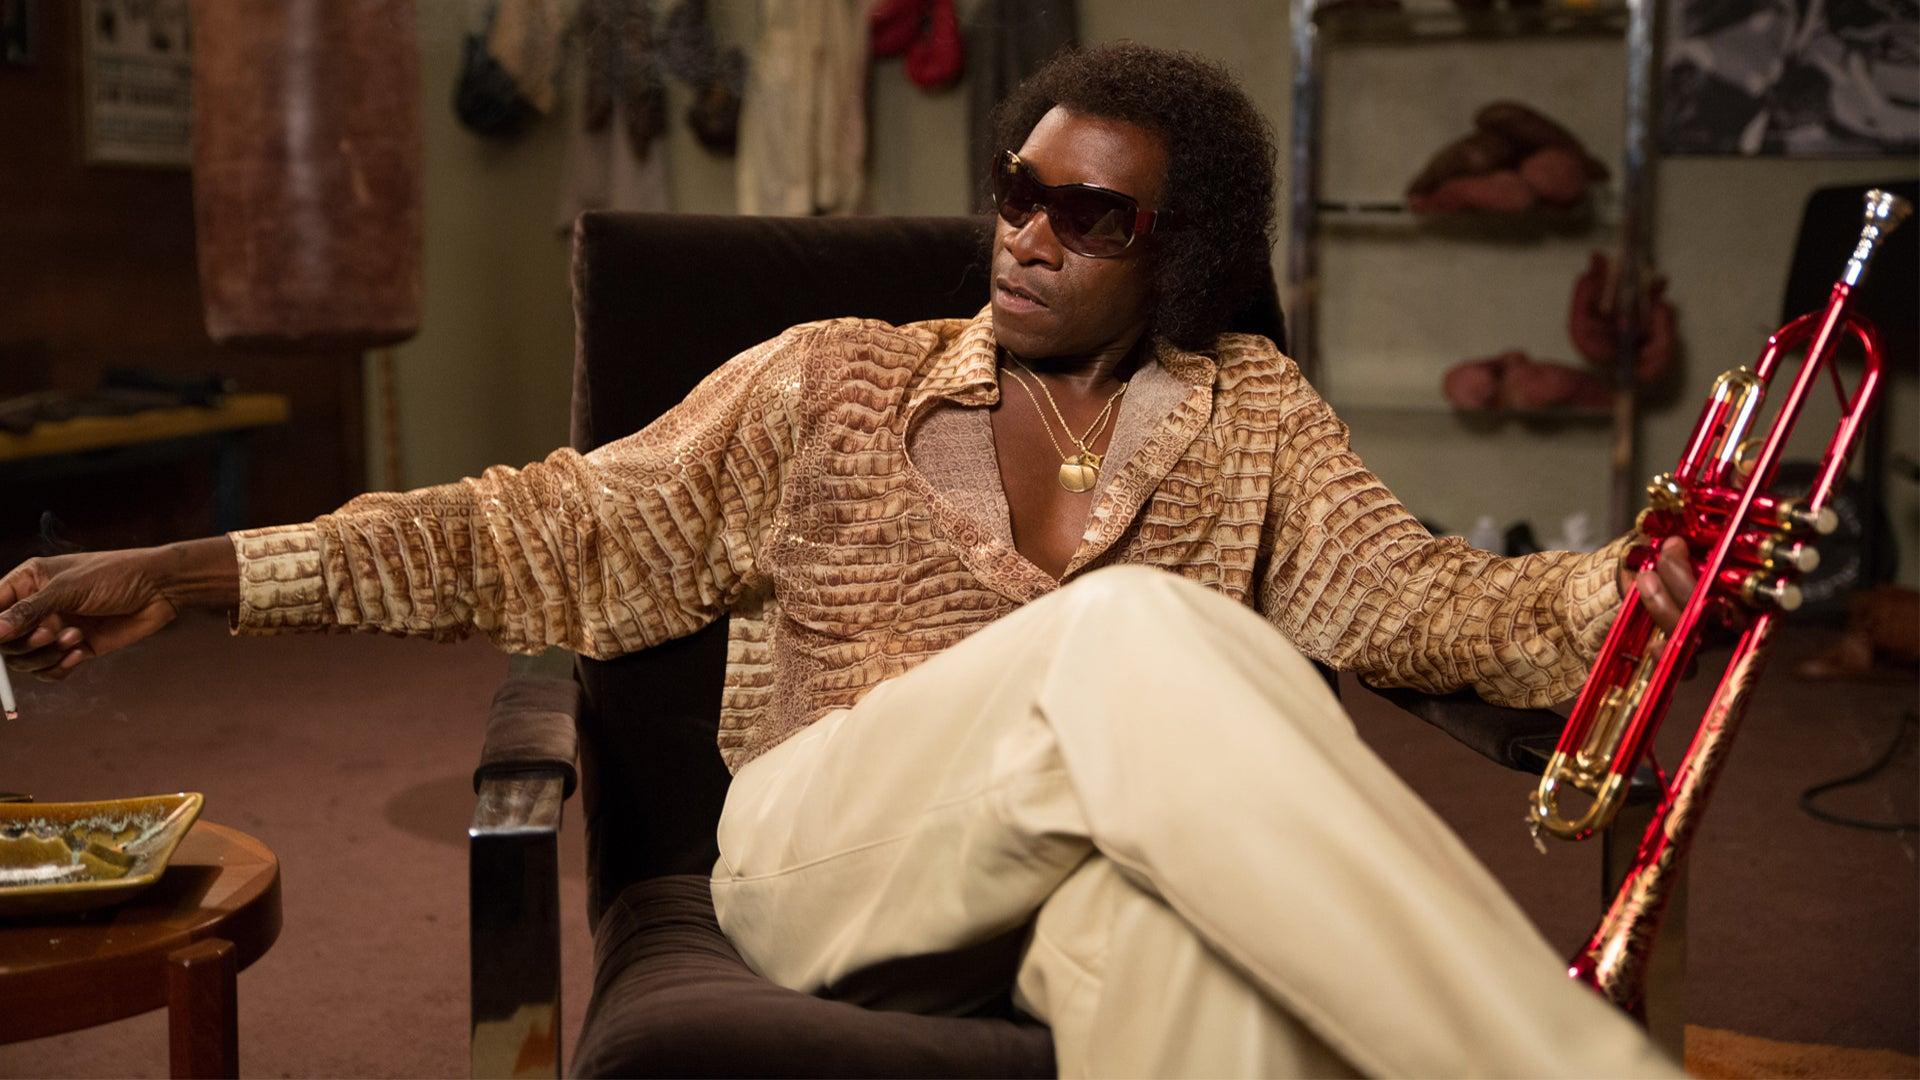 Don Cheadle Stuns as Miles Davis in New 'Miles Ahead' Trailer